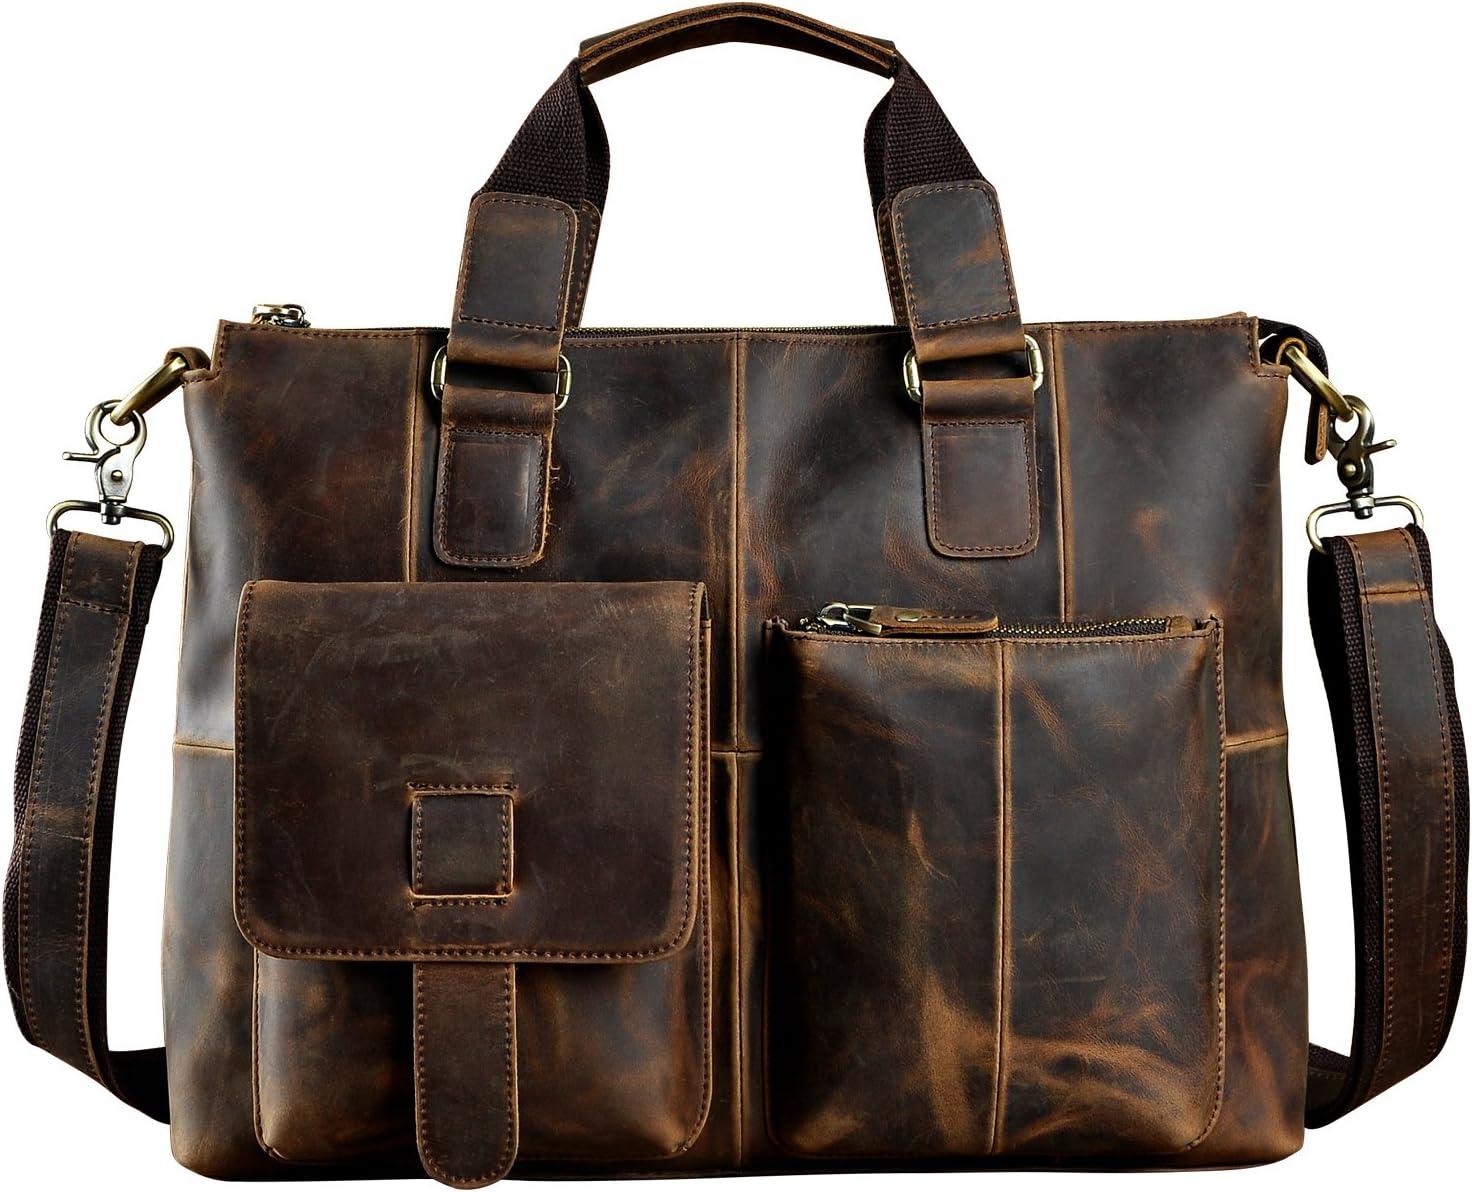 Travelpro Maxlite 4 International Expandable Rollaboard Suitcase, Blue